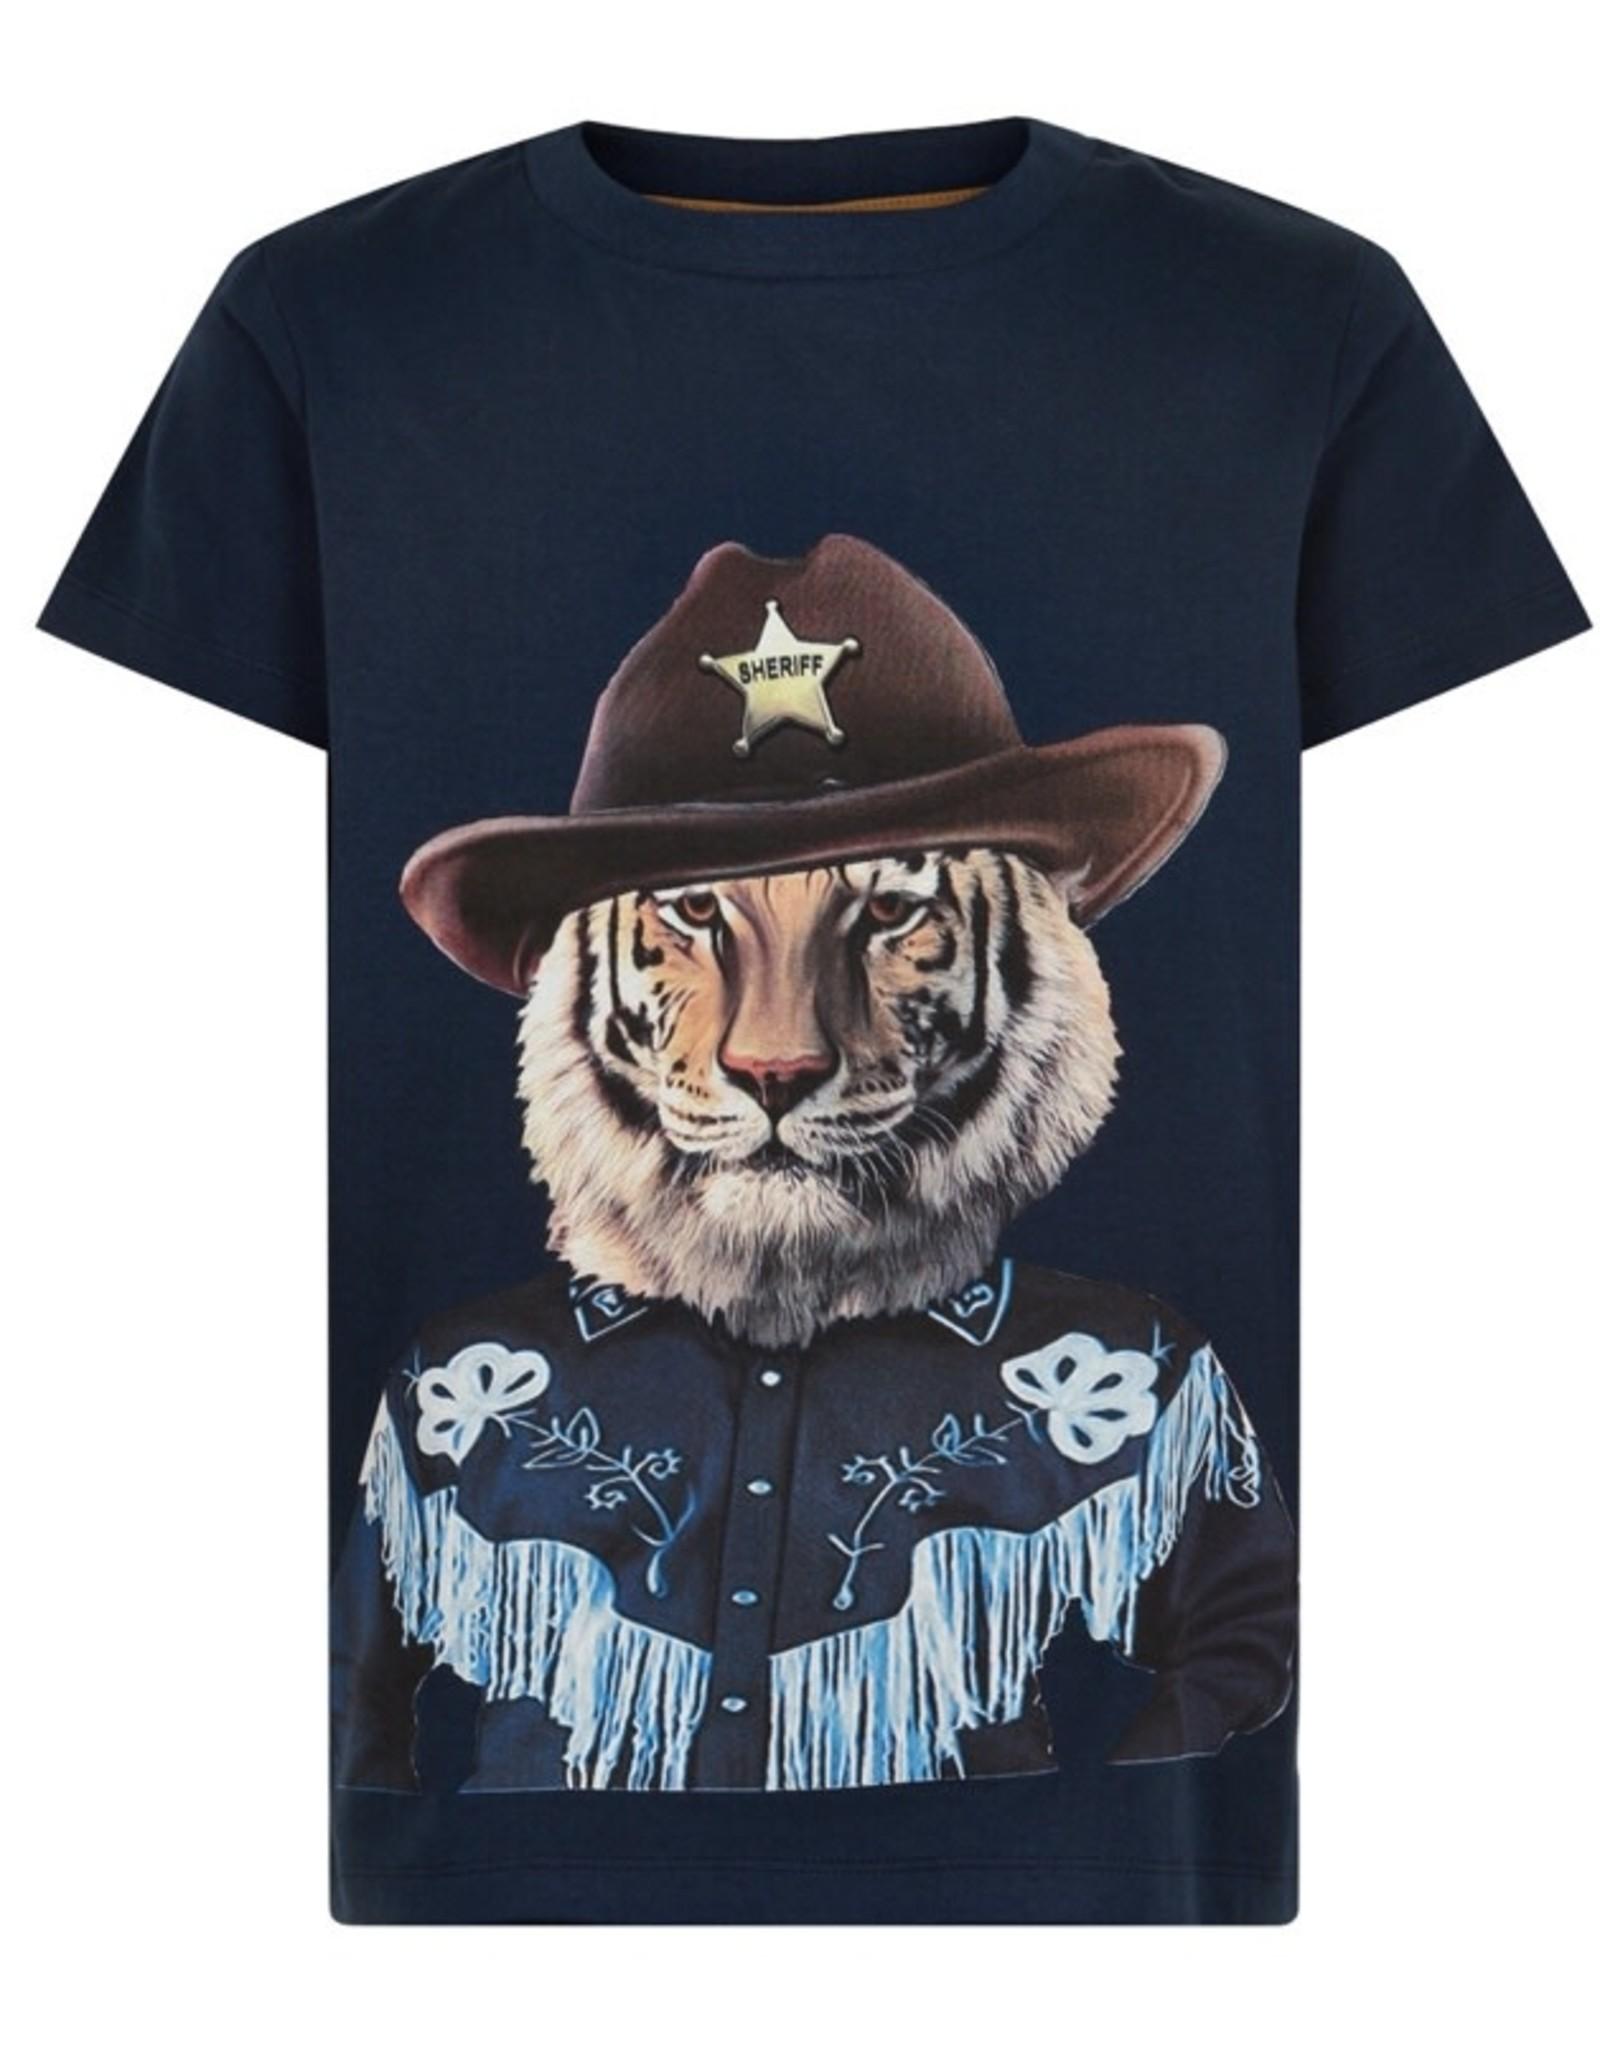 The New Tucker T-Shirt